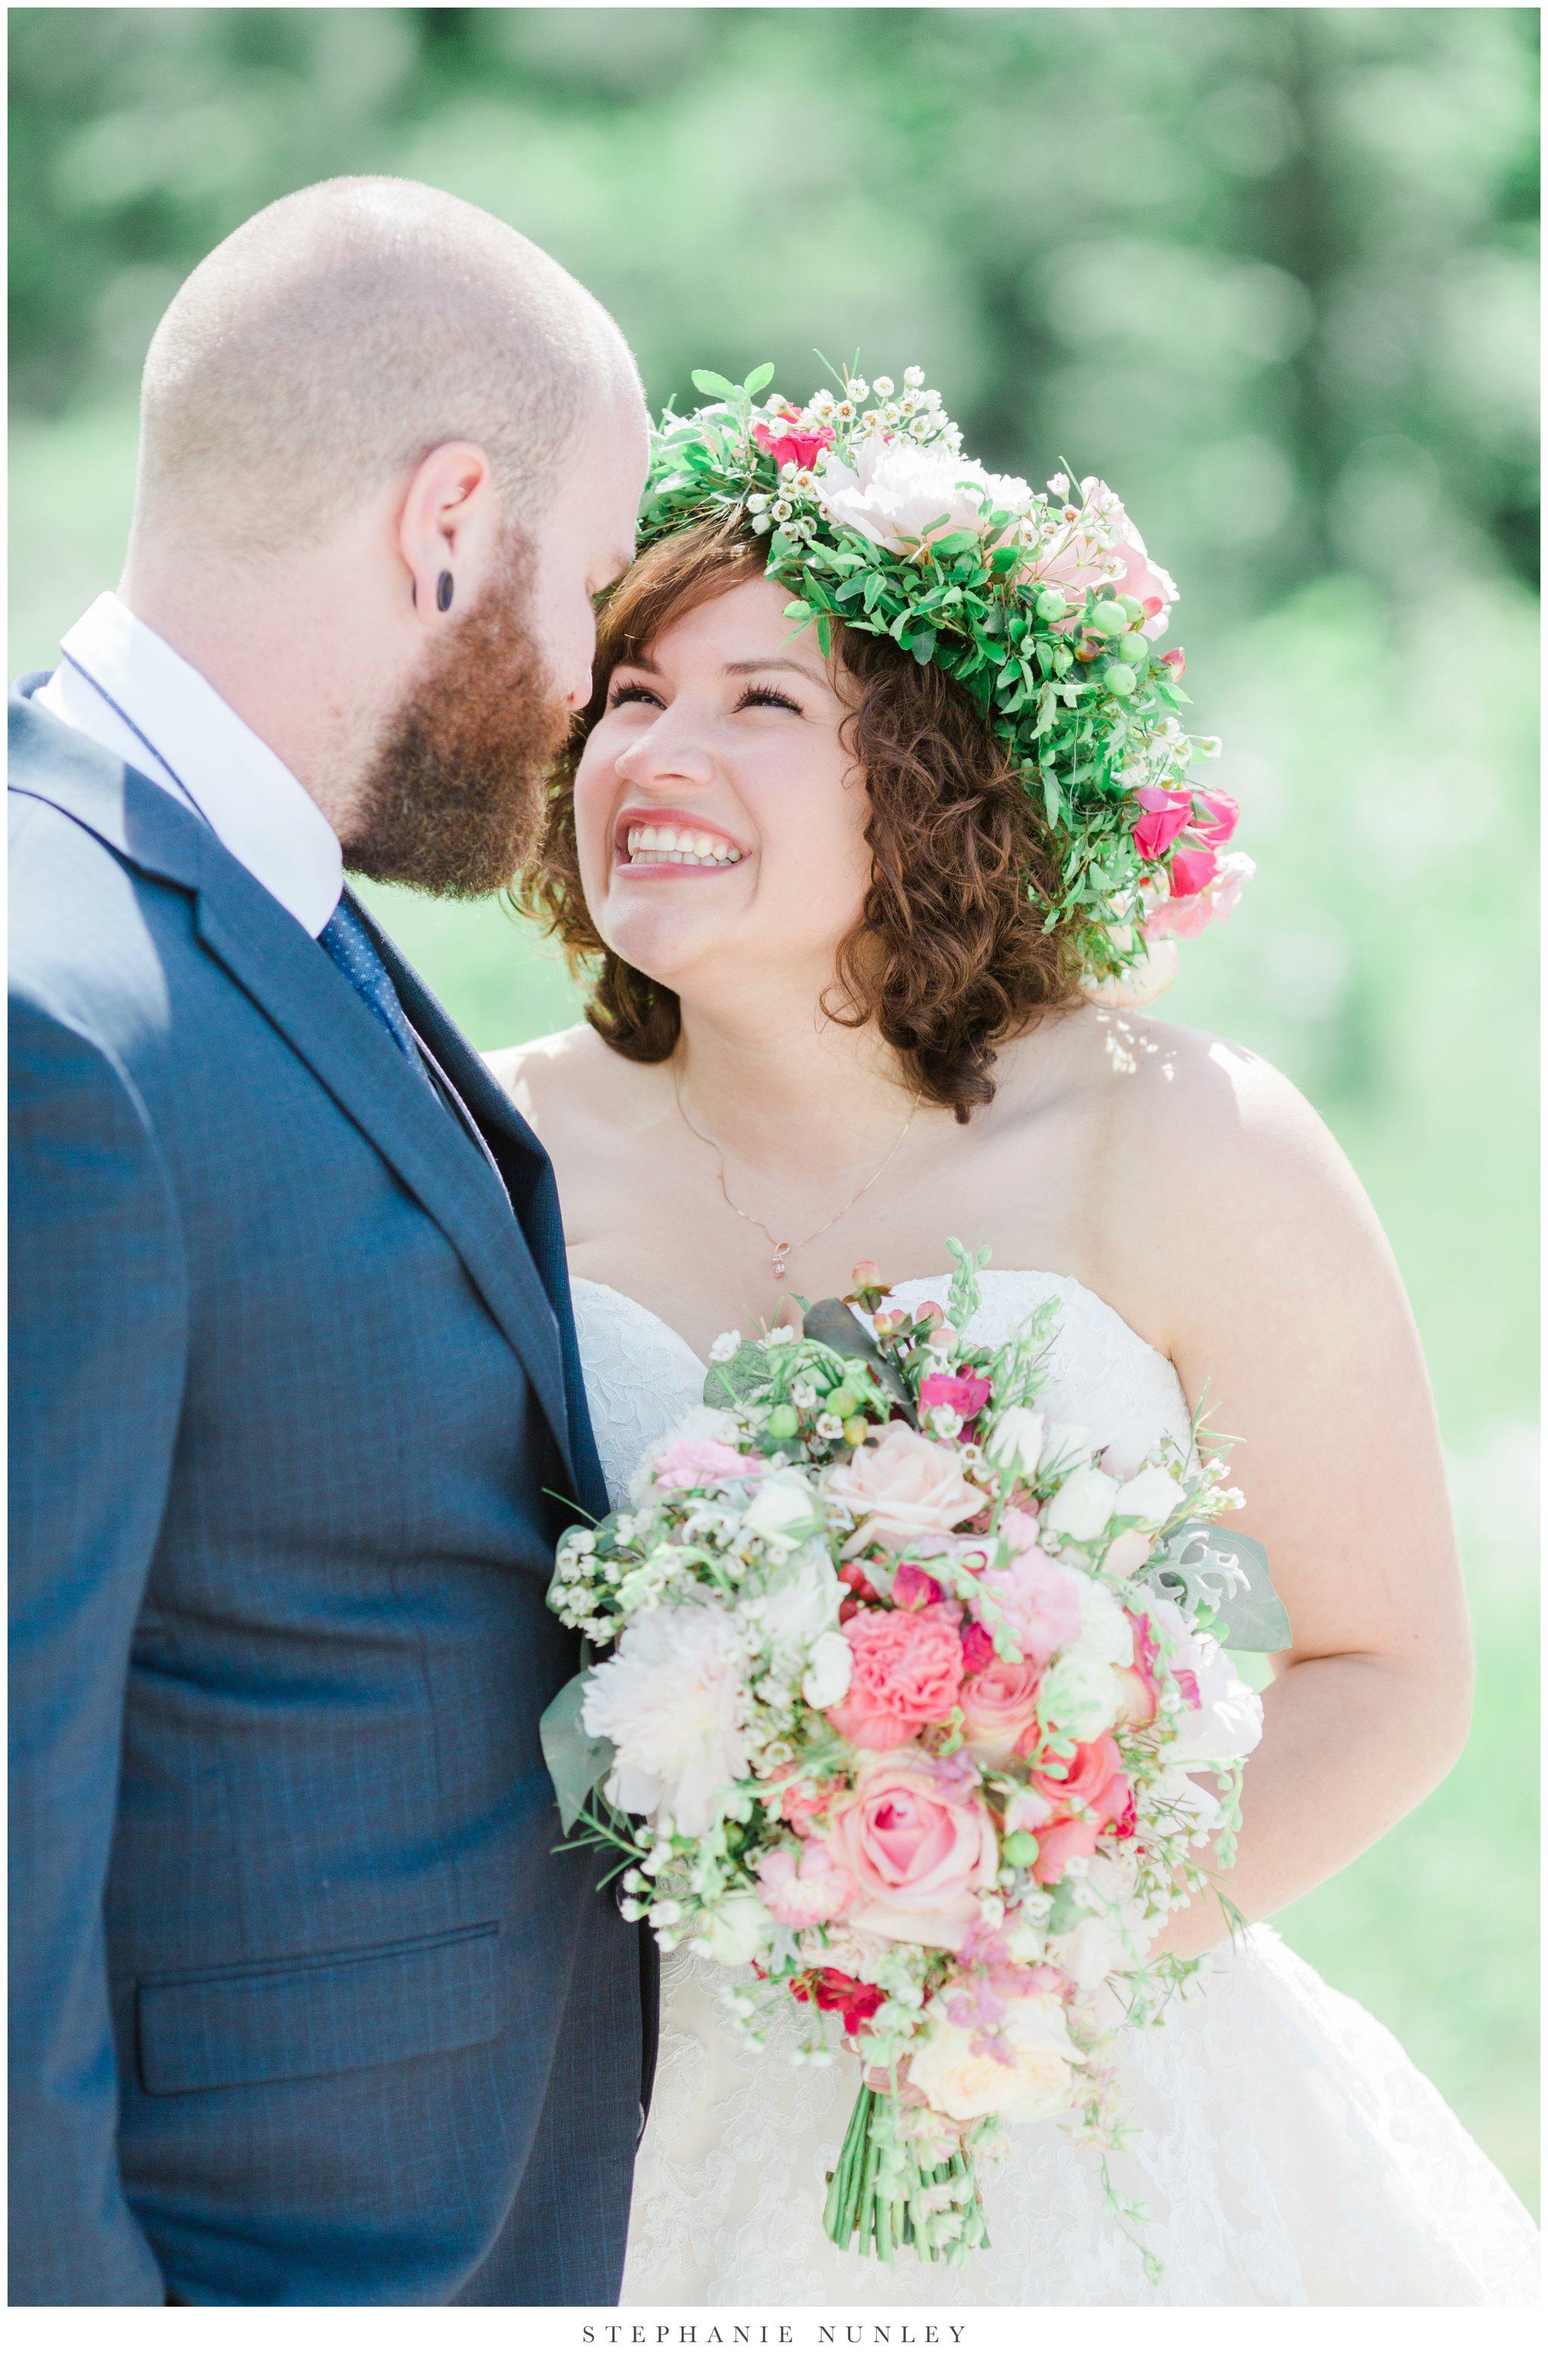 romantic-outdoor-wedding-with-flower-crown-0035.jpg